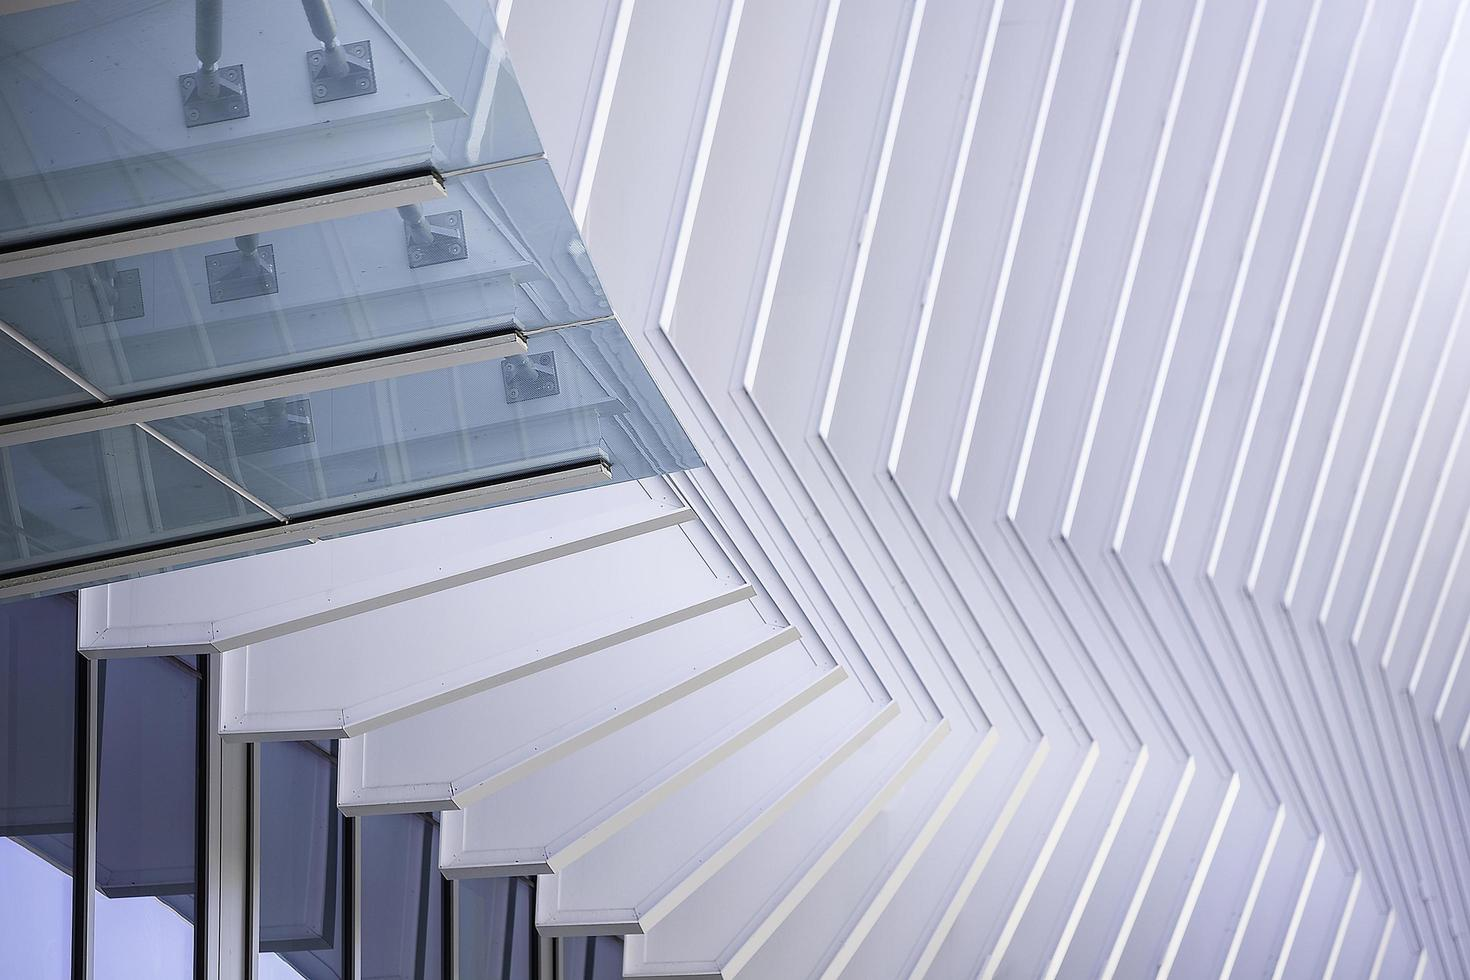 Miami, Florida, 2020 - Contemporary metal building photo